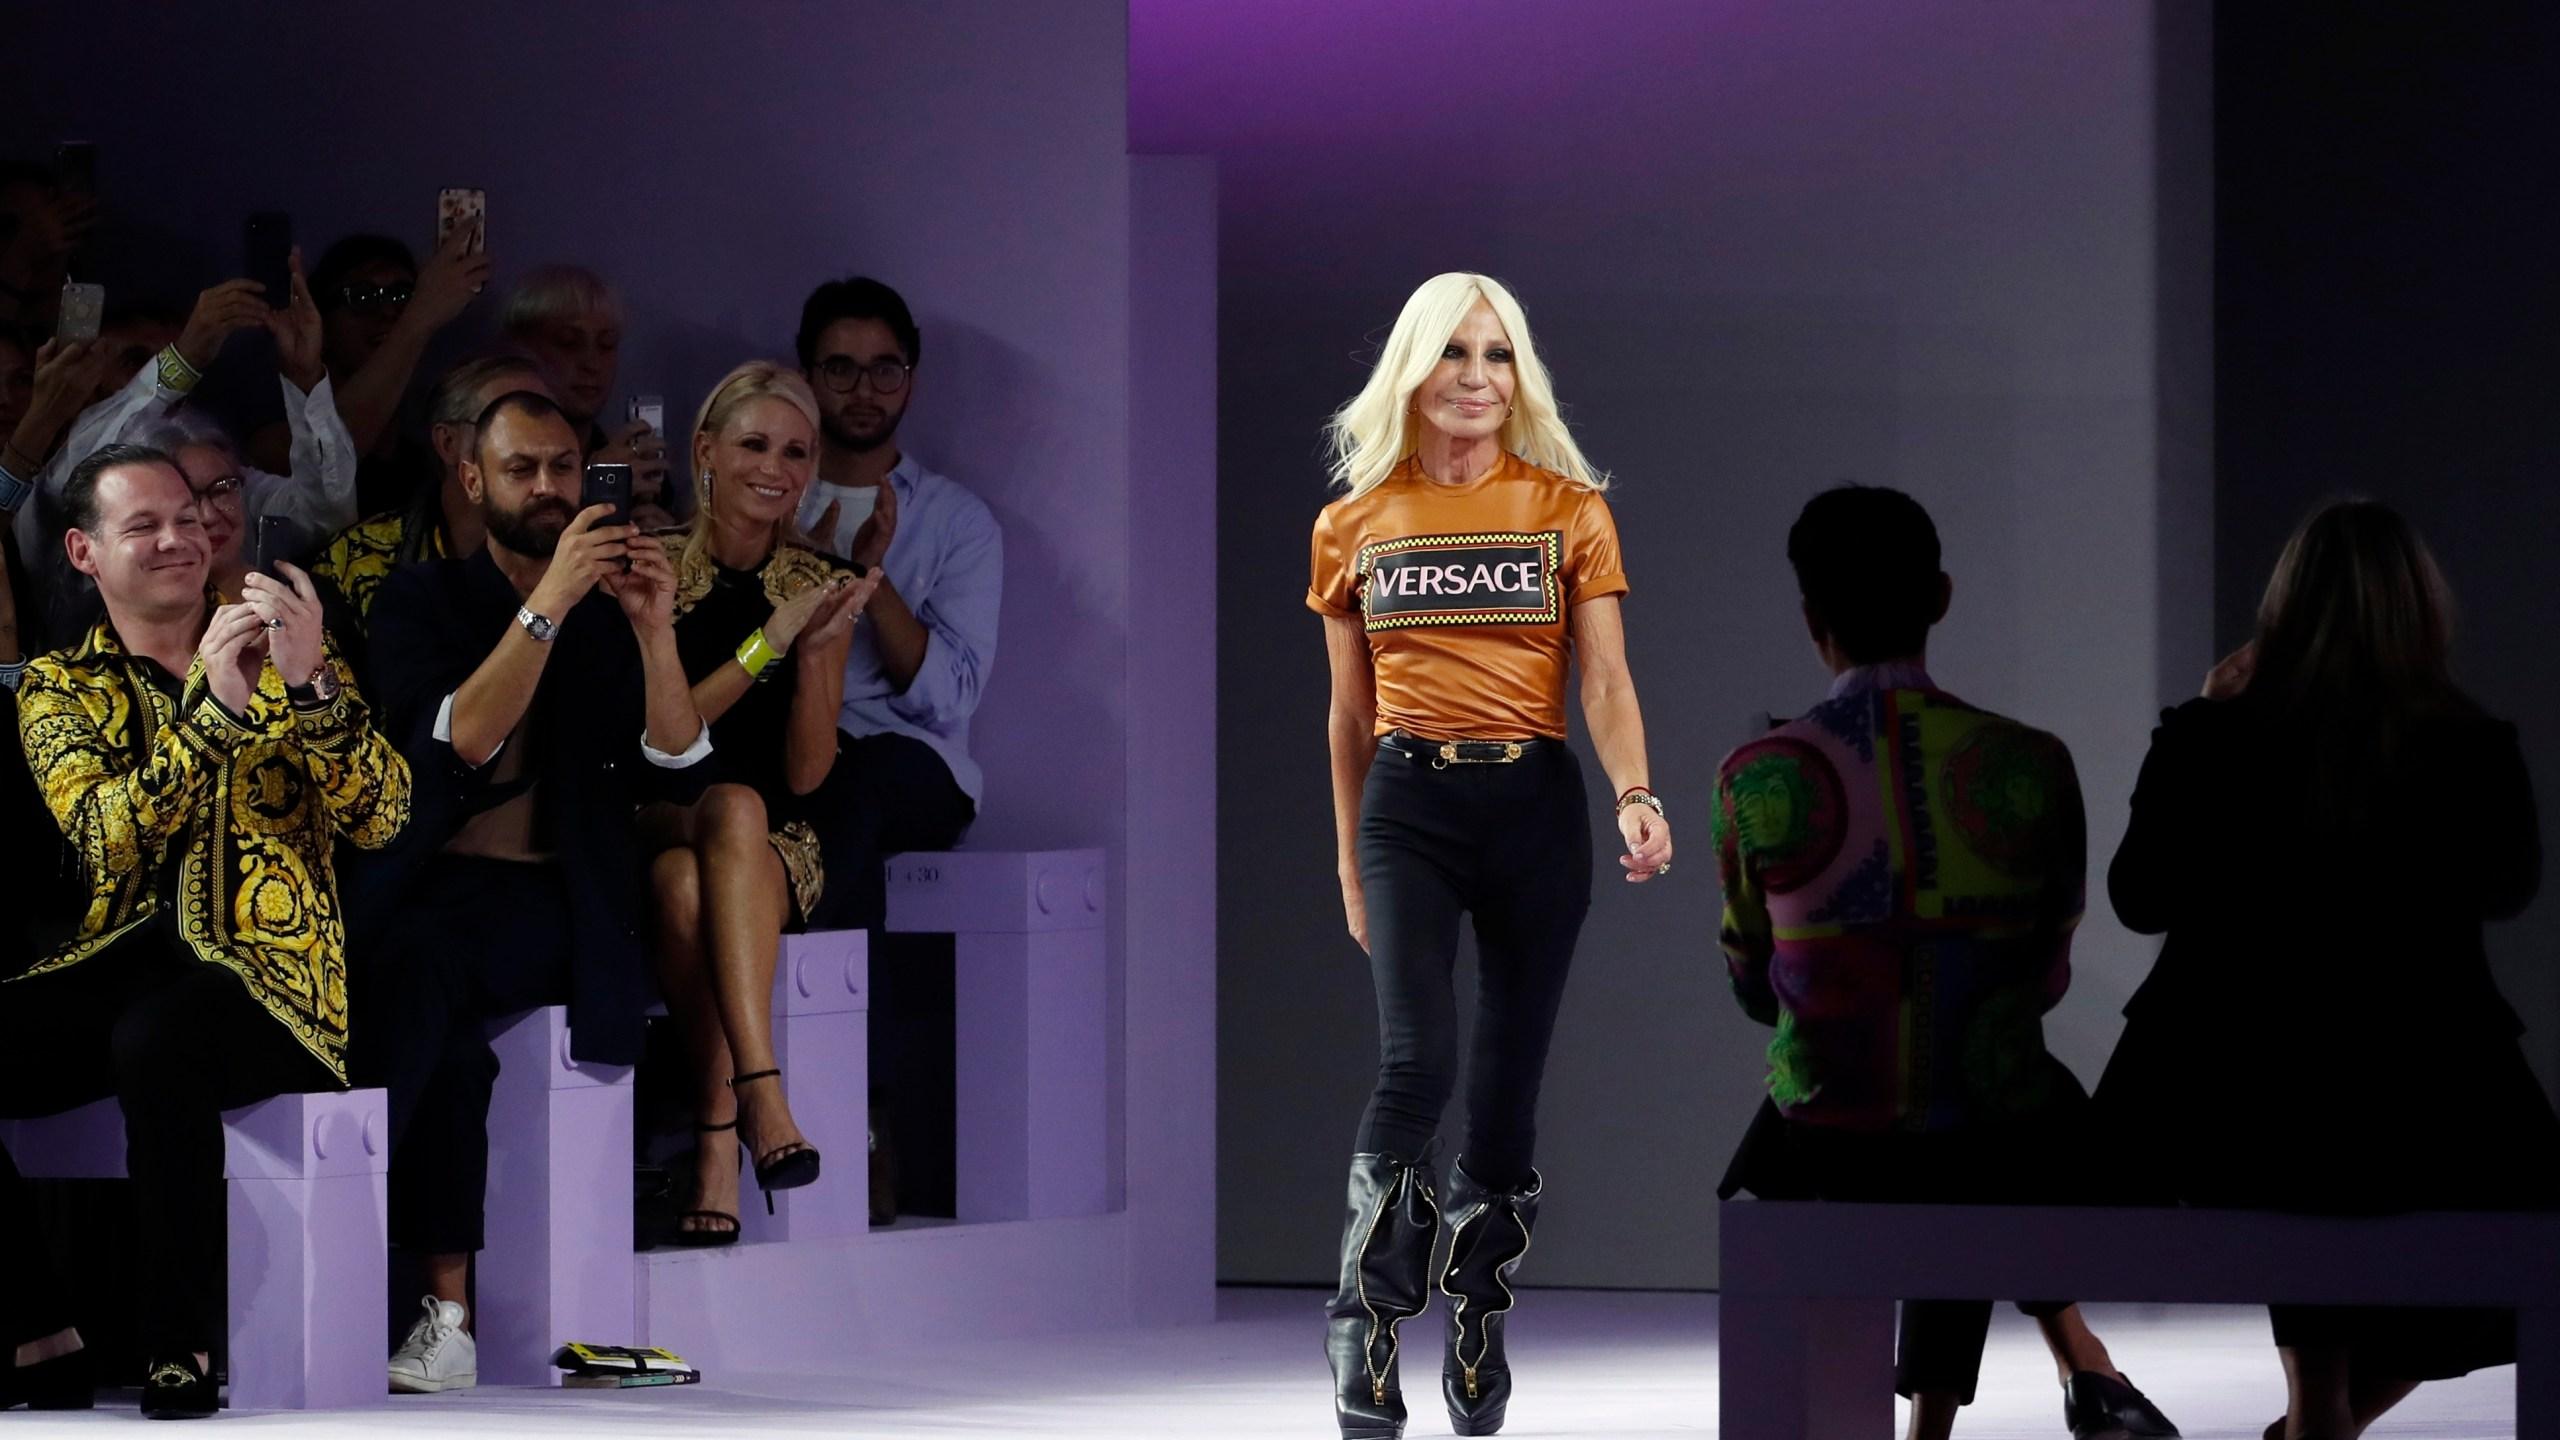 Italy_Fashion_Versace_03710-159532.jpg78505131